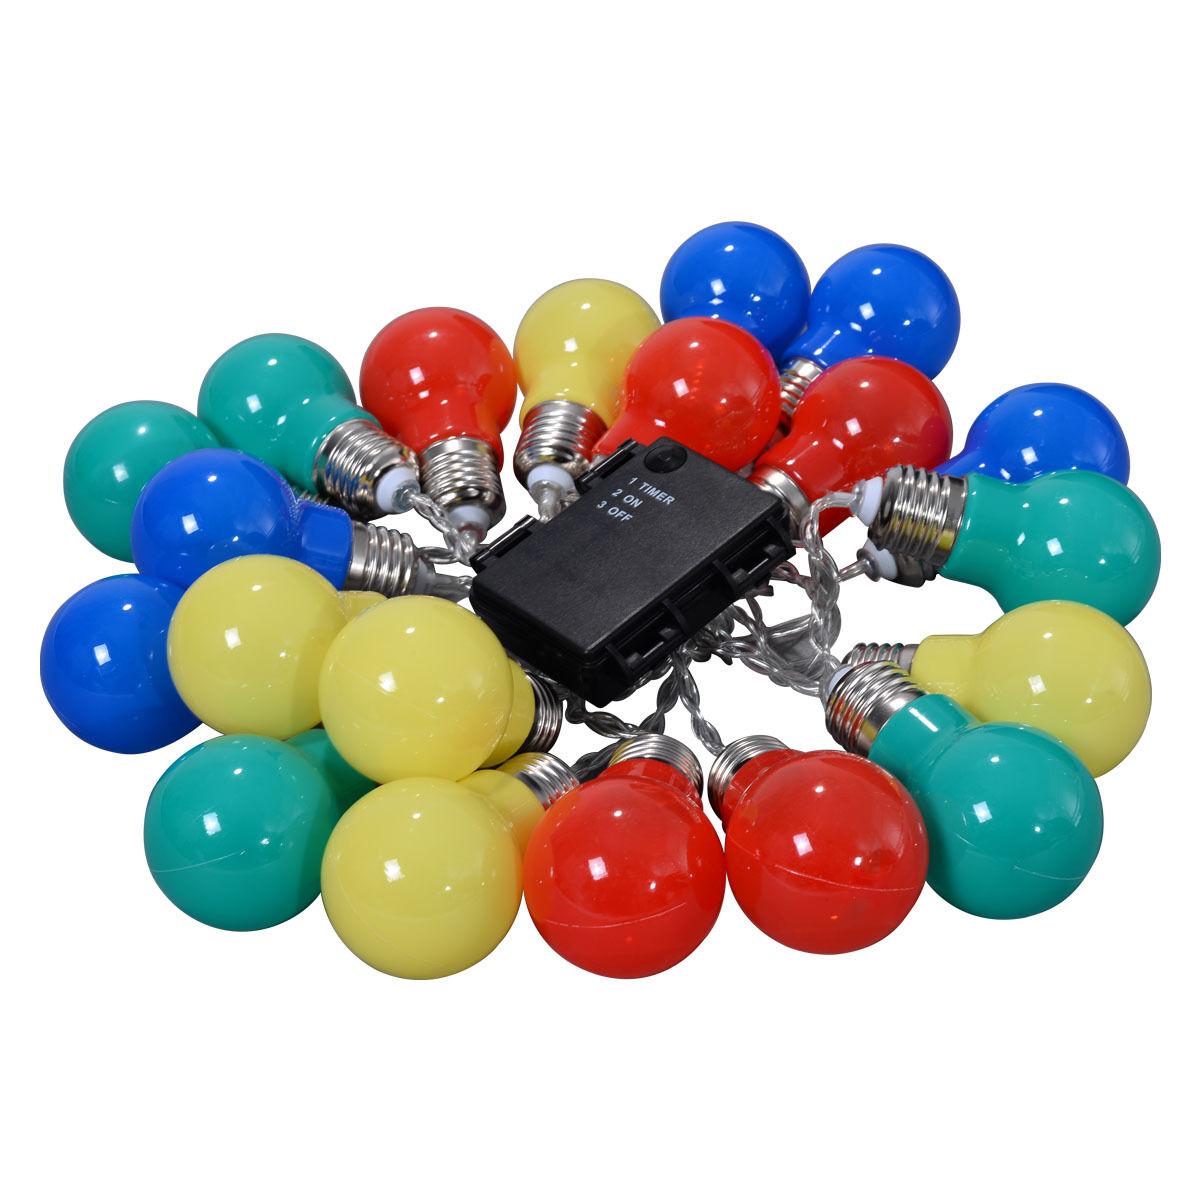 Christmas-LED-String-Ball-Lights-Xmas-Wedding-Party-Garden-Decor-Lamp-Colorful thumbnail 15